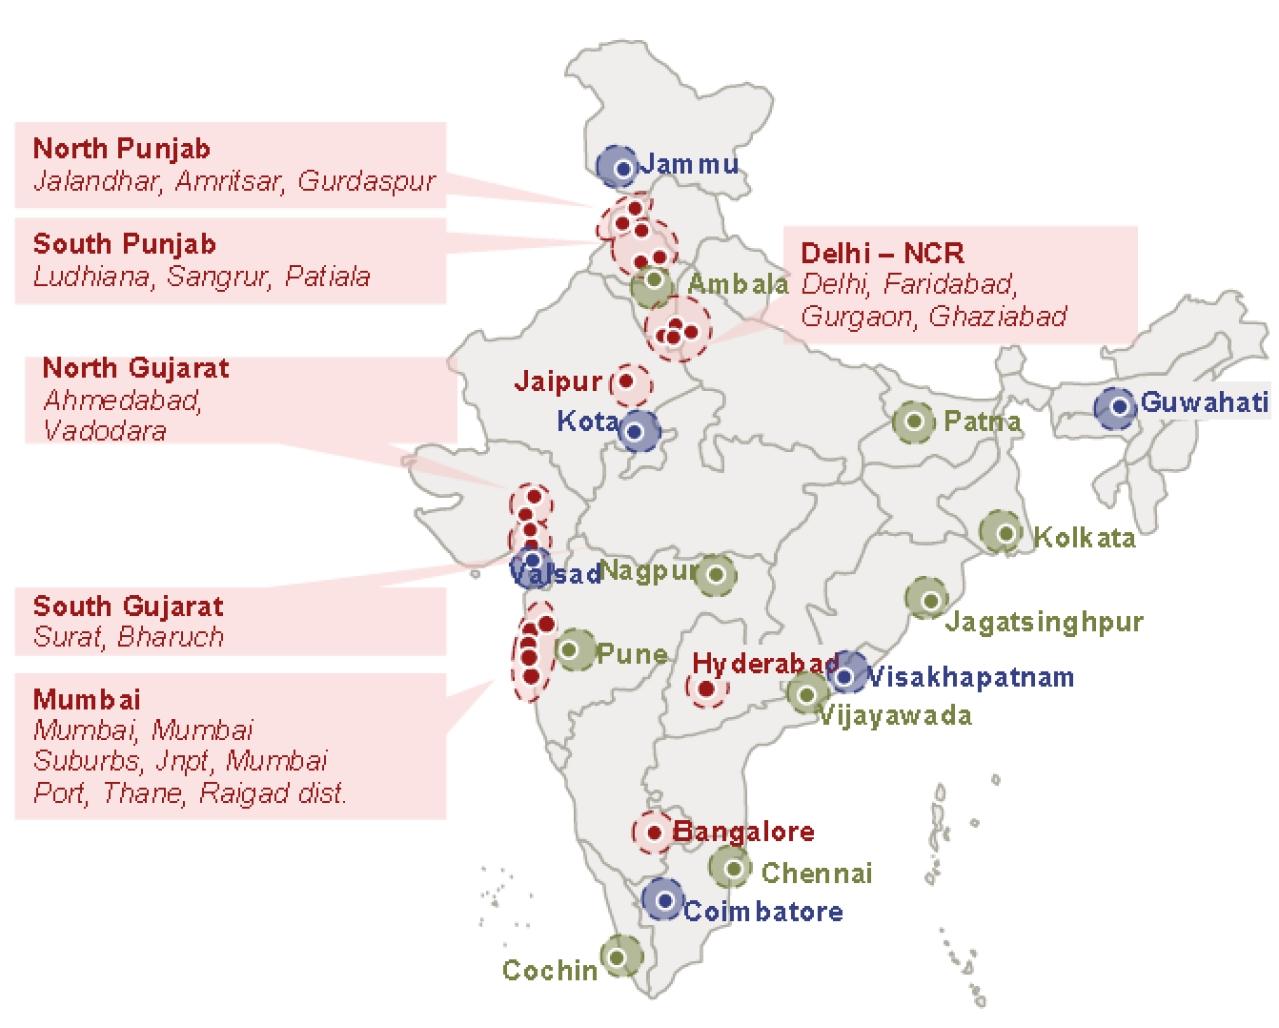 24 logistics parks identified under Bharatmala